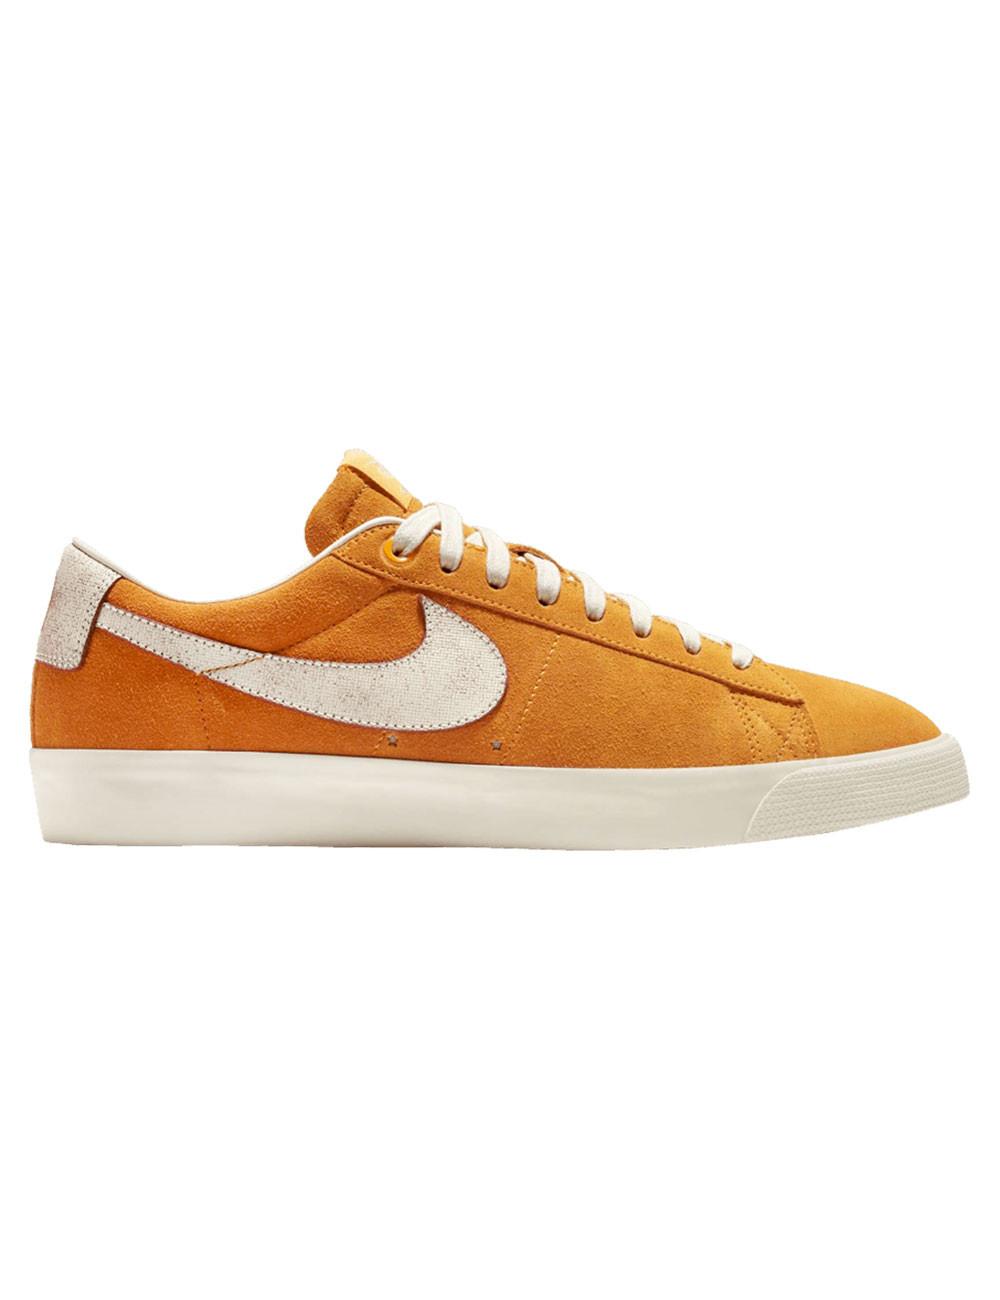 Nike sb Blazer low gt qs - 716890-816 | Shapestore.it